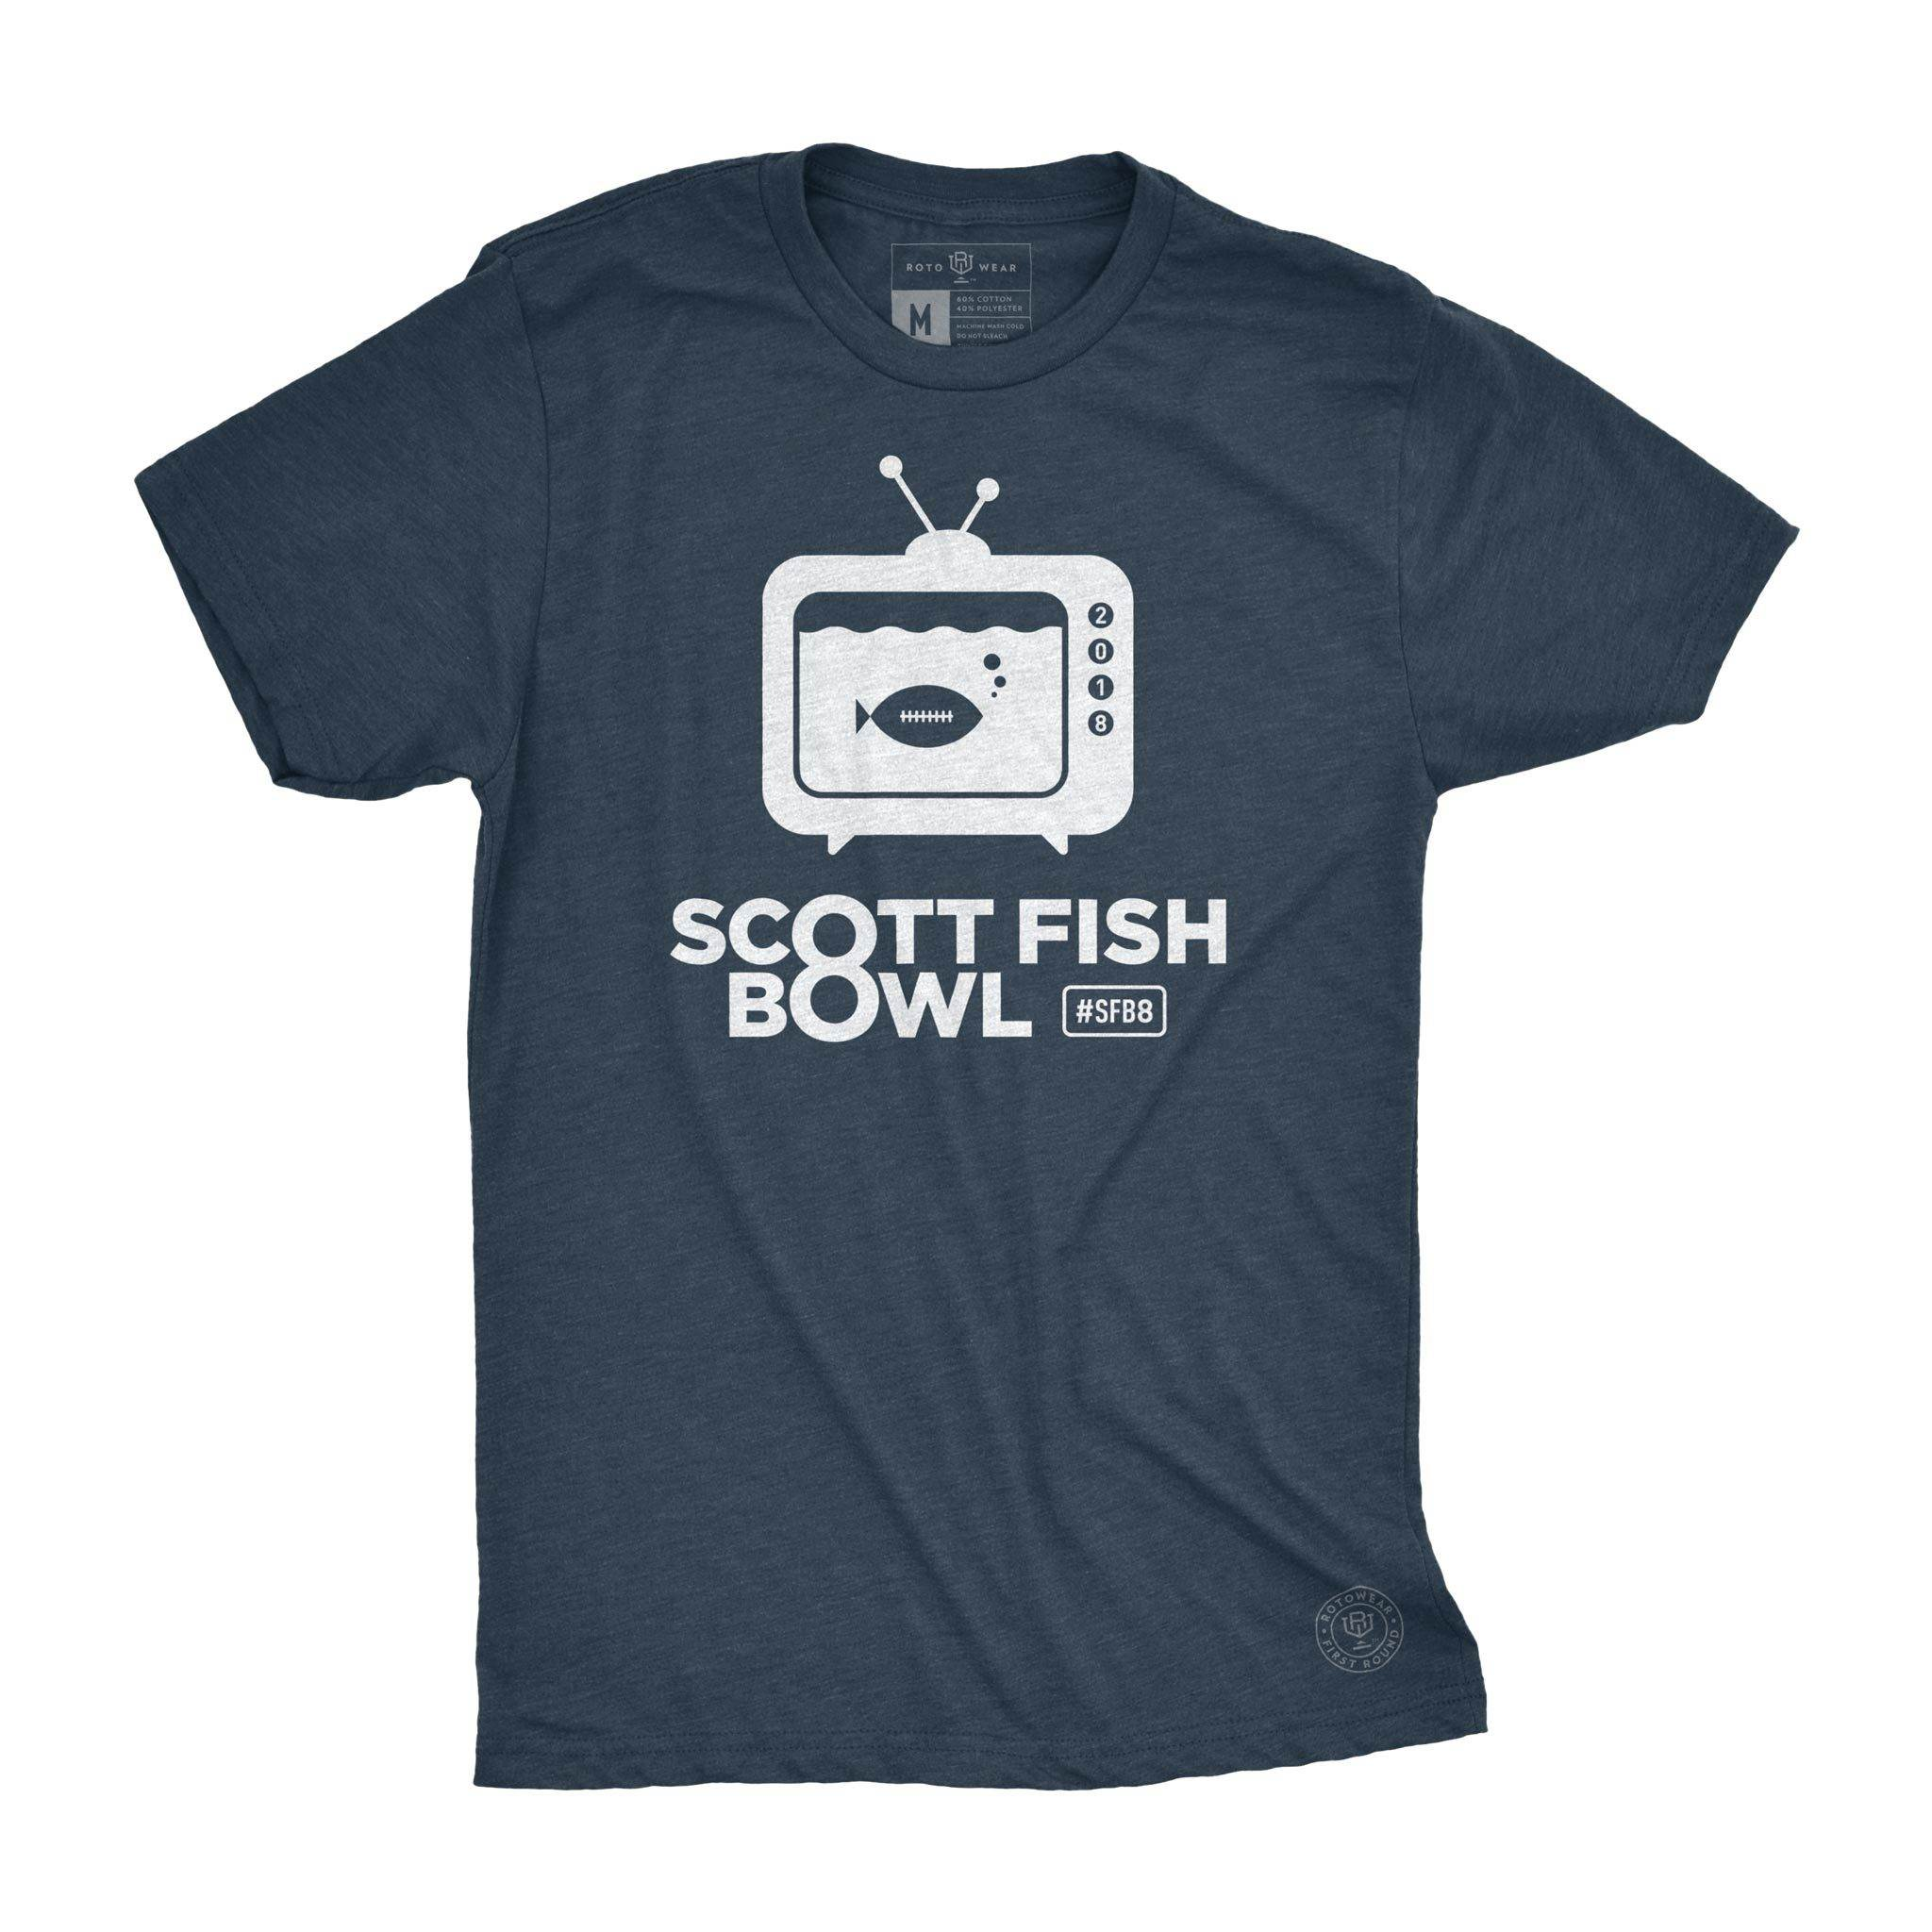 What is Scott Fish Bowl?